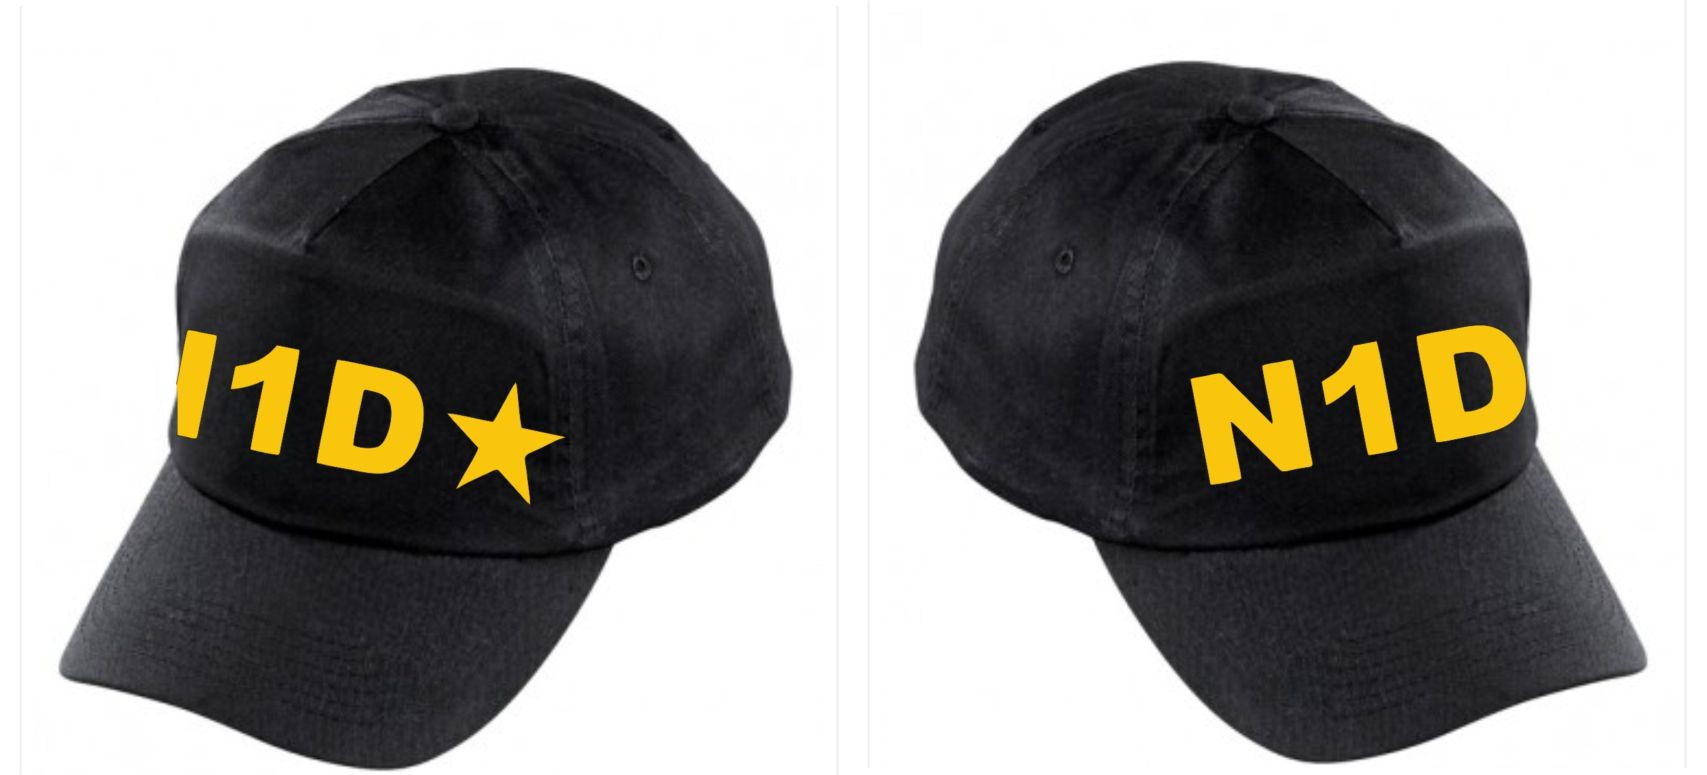 PP *#041032#* Cotton Baseball Cap (Black) with N1 Dance Logo